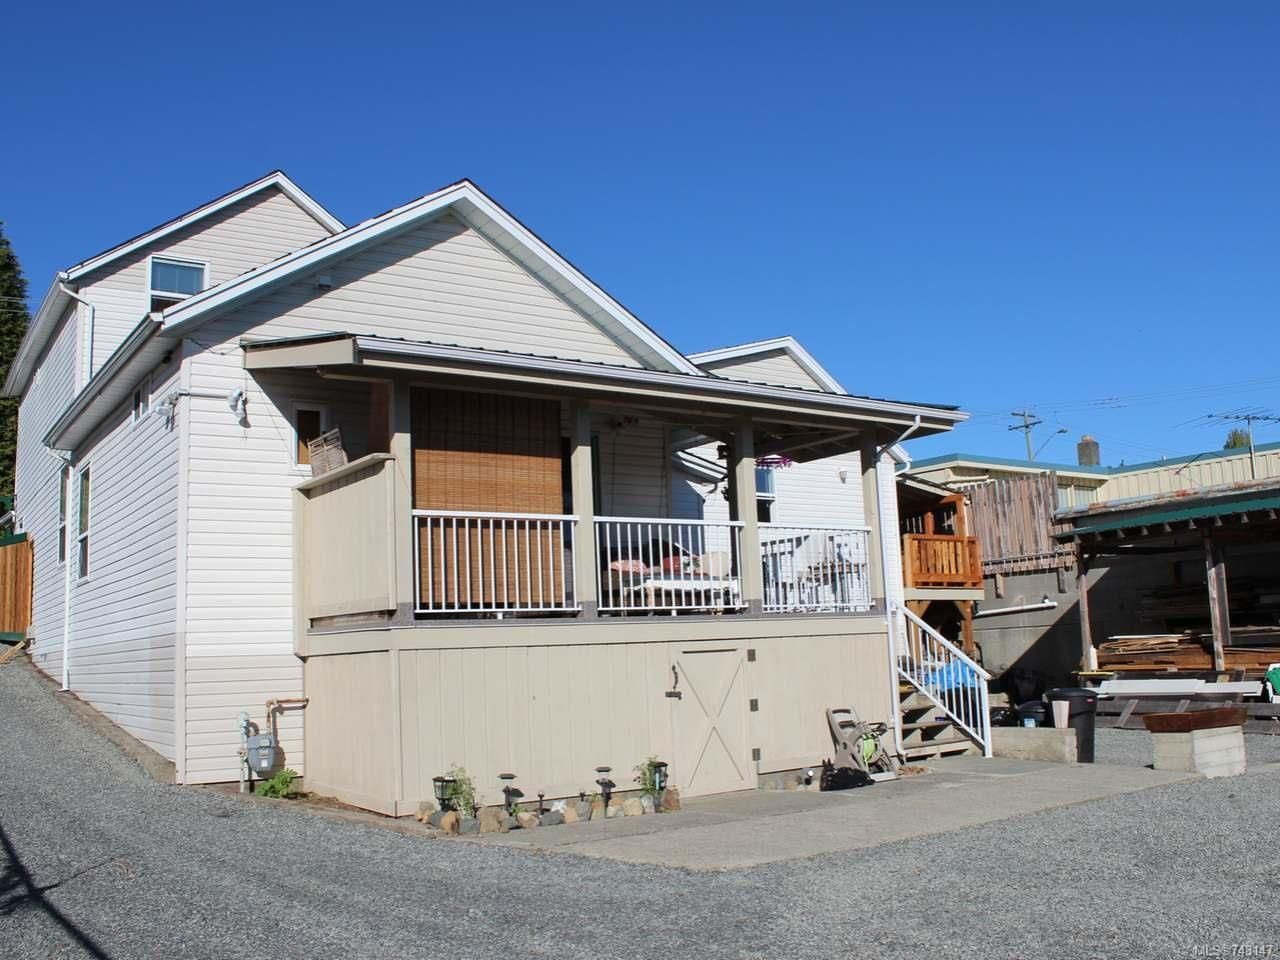 Main Photo: 345 Haliburton St in NANAIMO: Na South Nanaimo House for sale (Nanaimo)  : MLS®# 743147